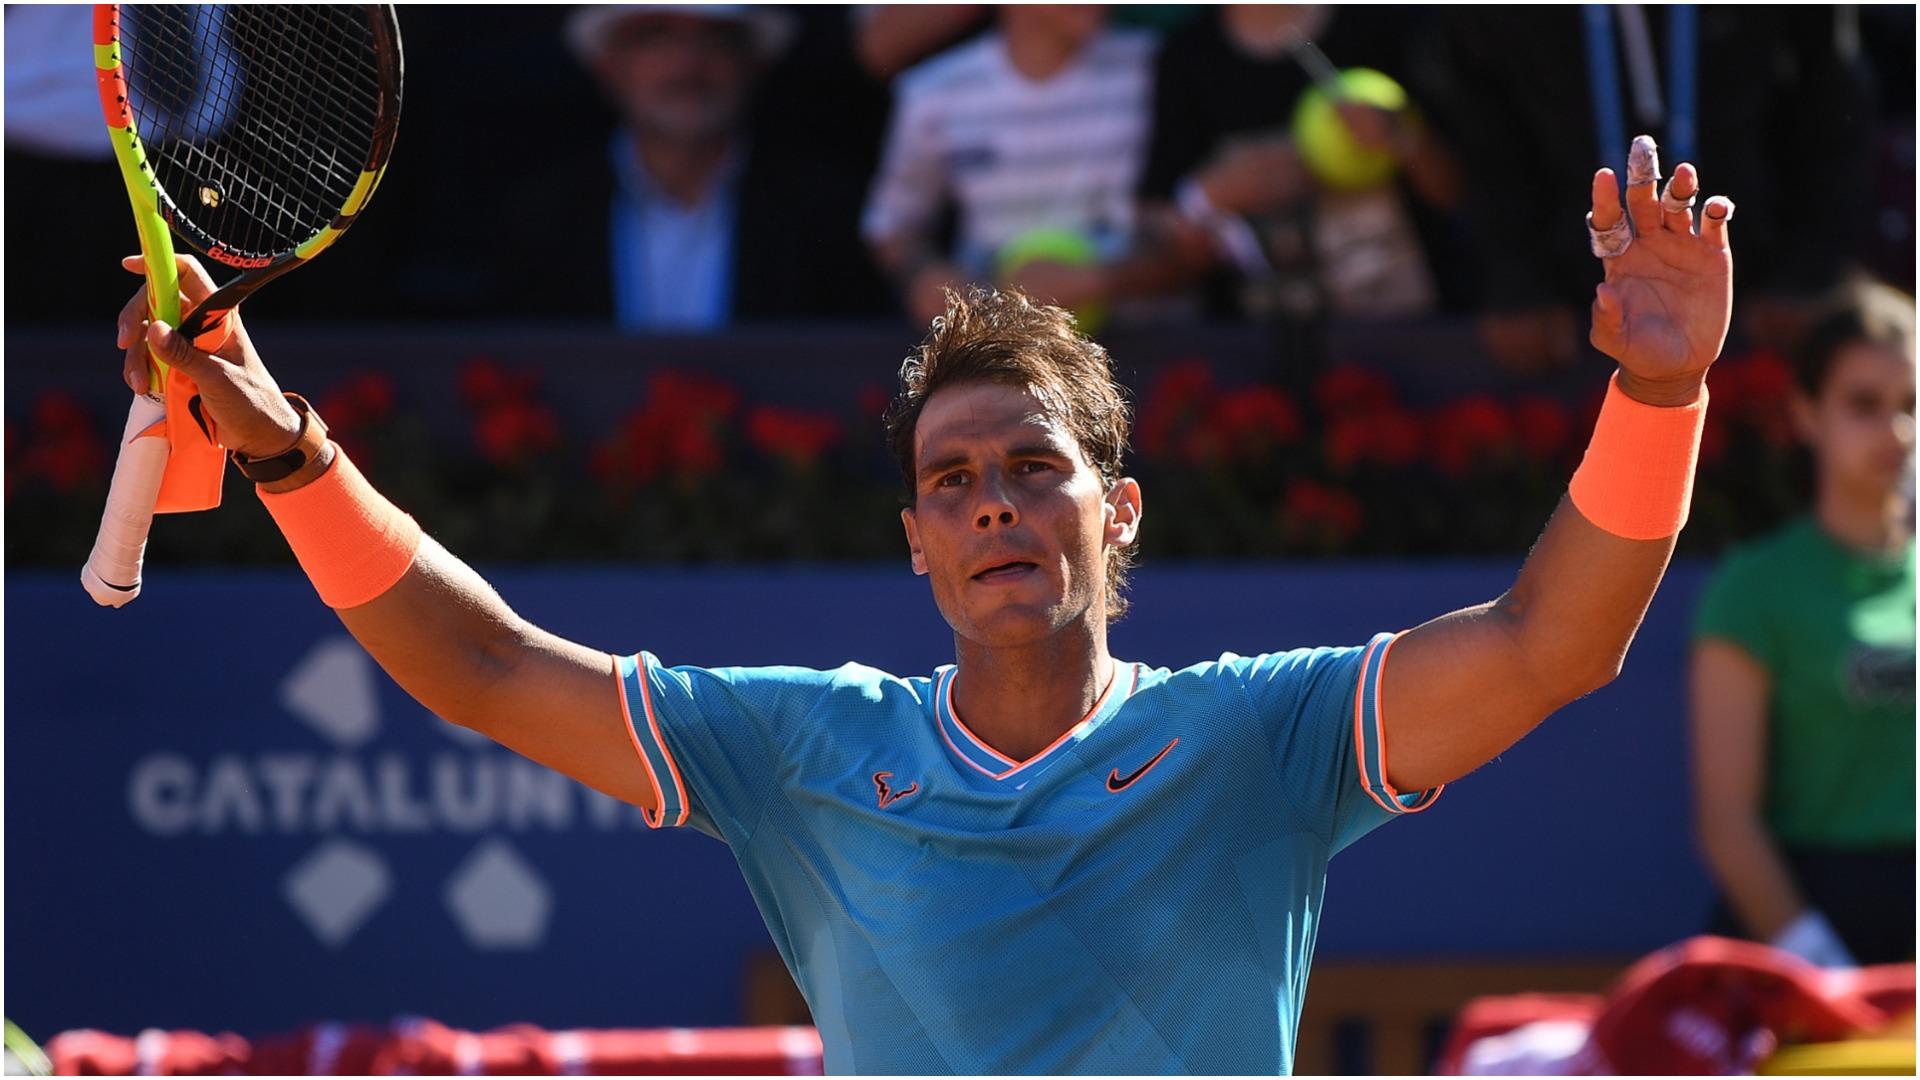 Nadal overcomes Ferrer and rain in Spain